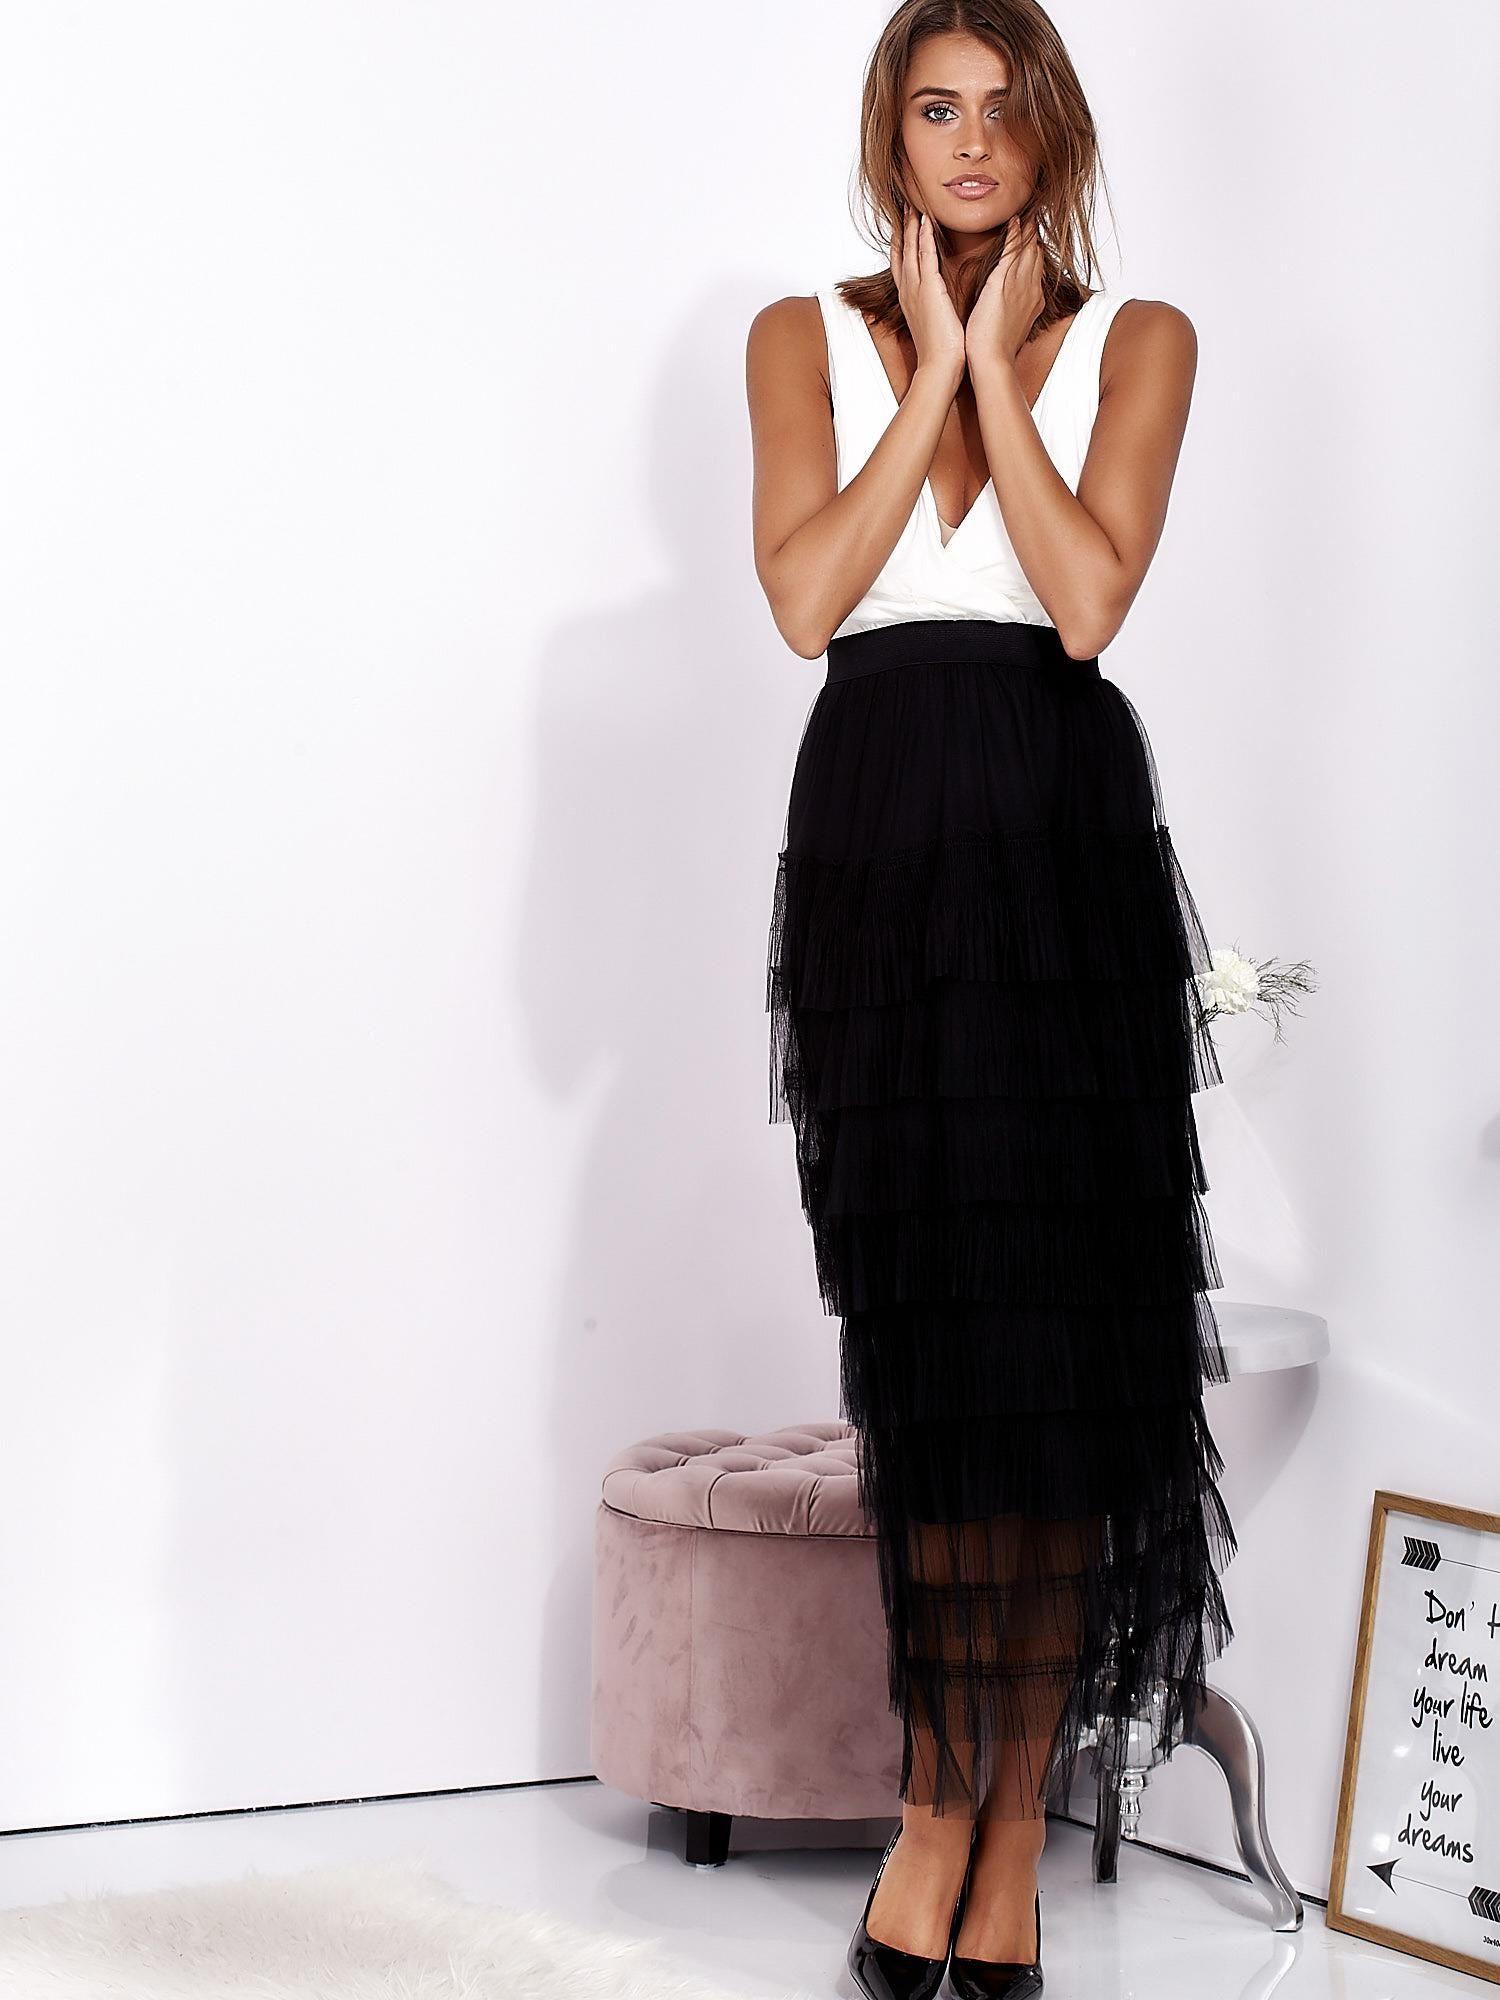 179d55bdd9 Biało-czarna sukienka maxi z plisowanymi falbanami - Sukienka ...